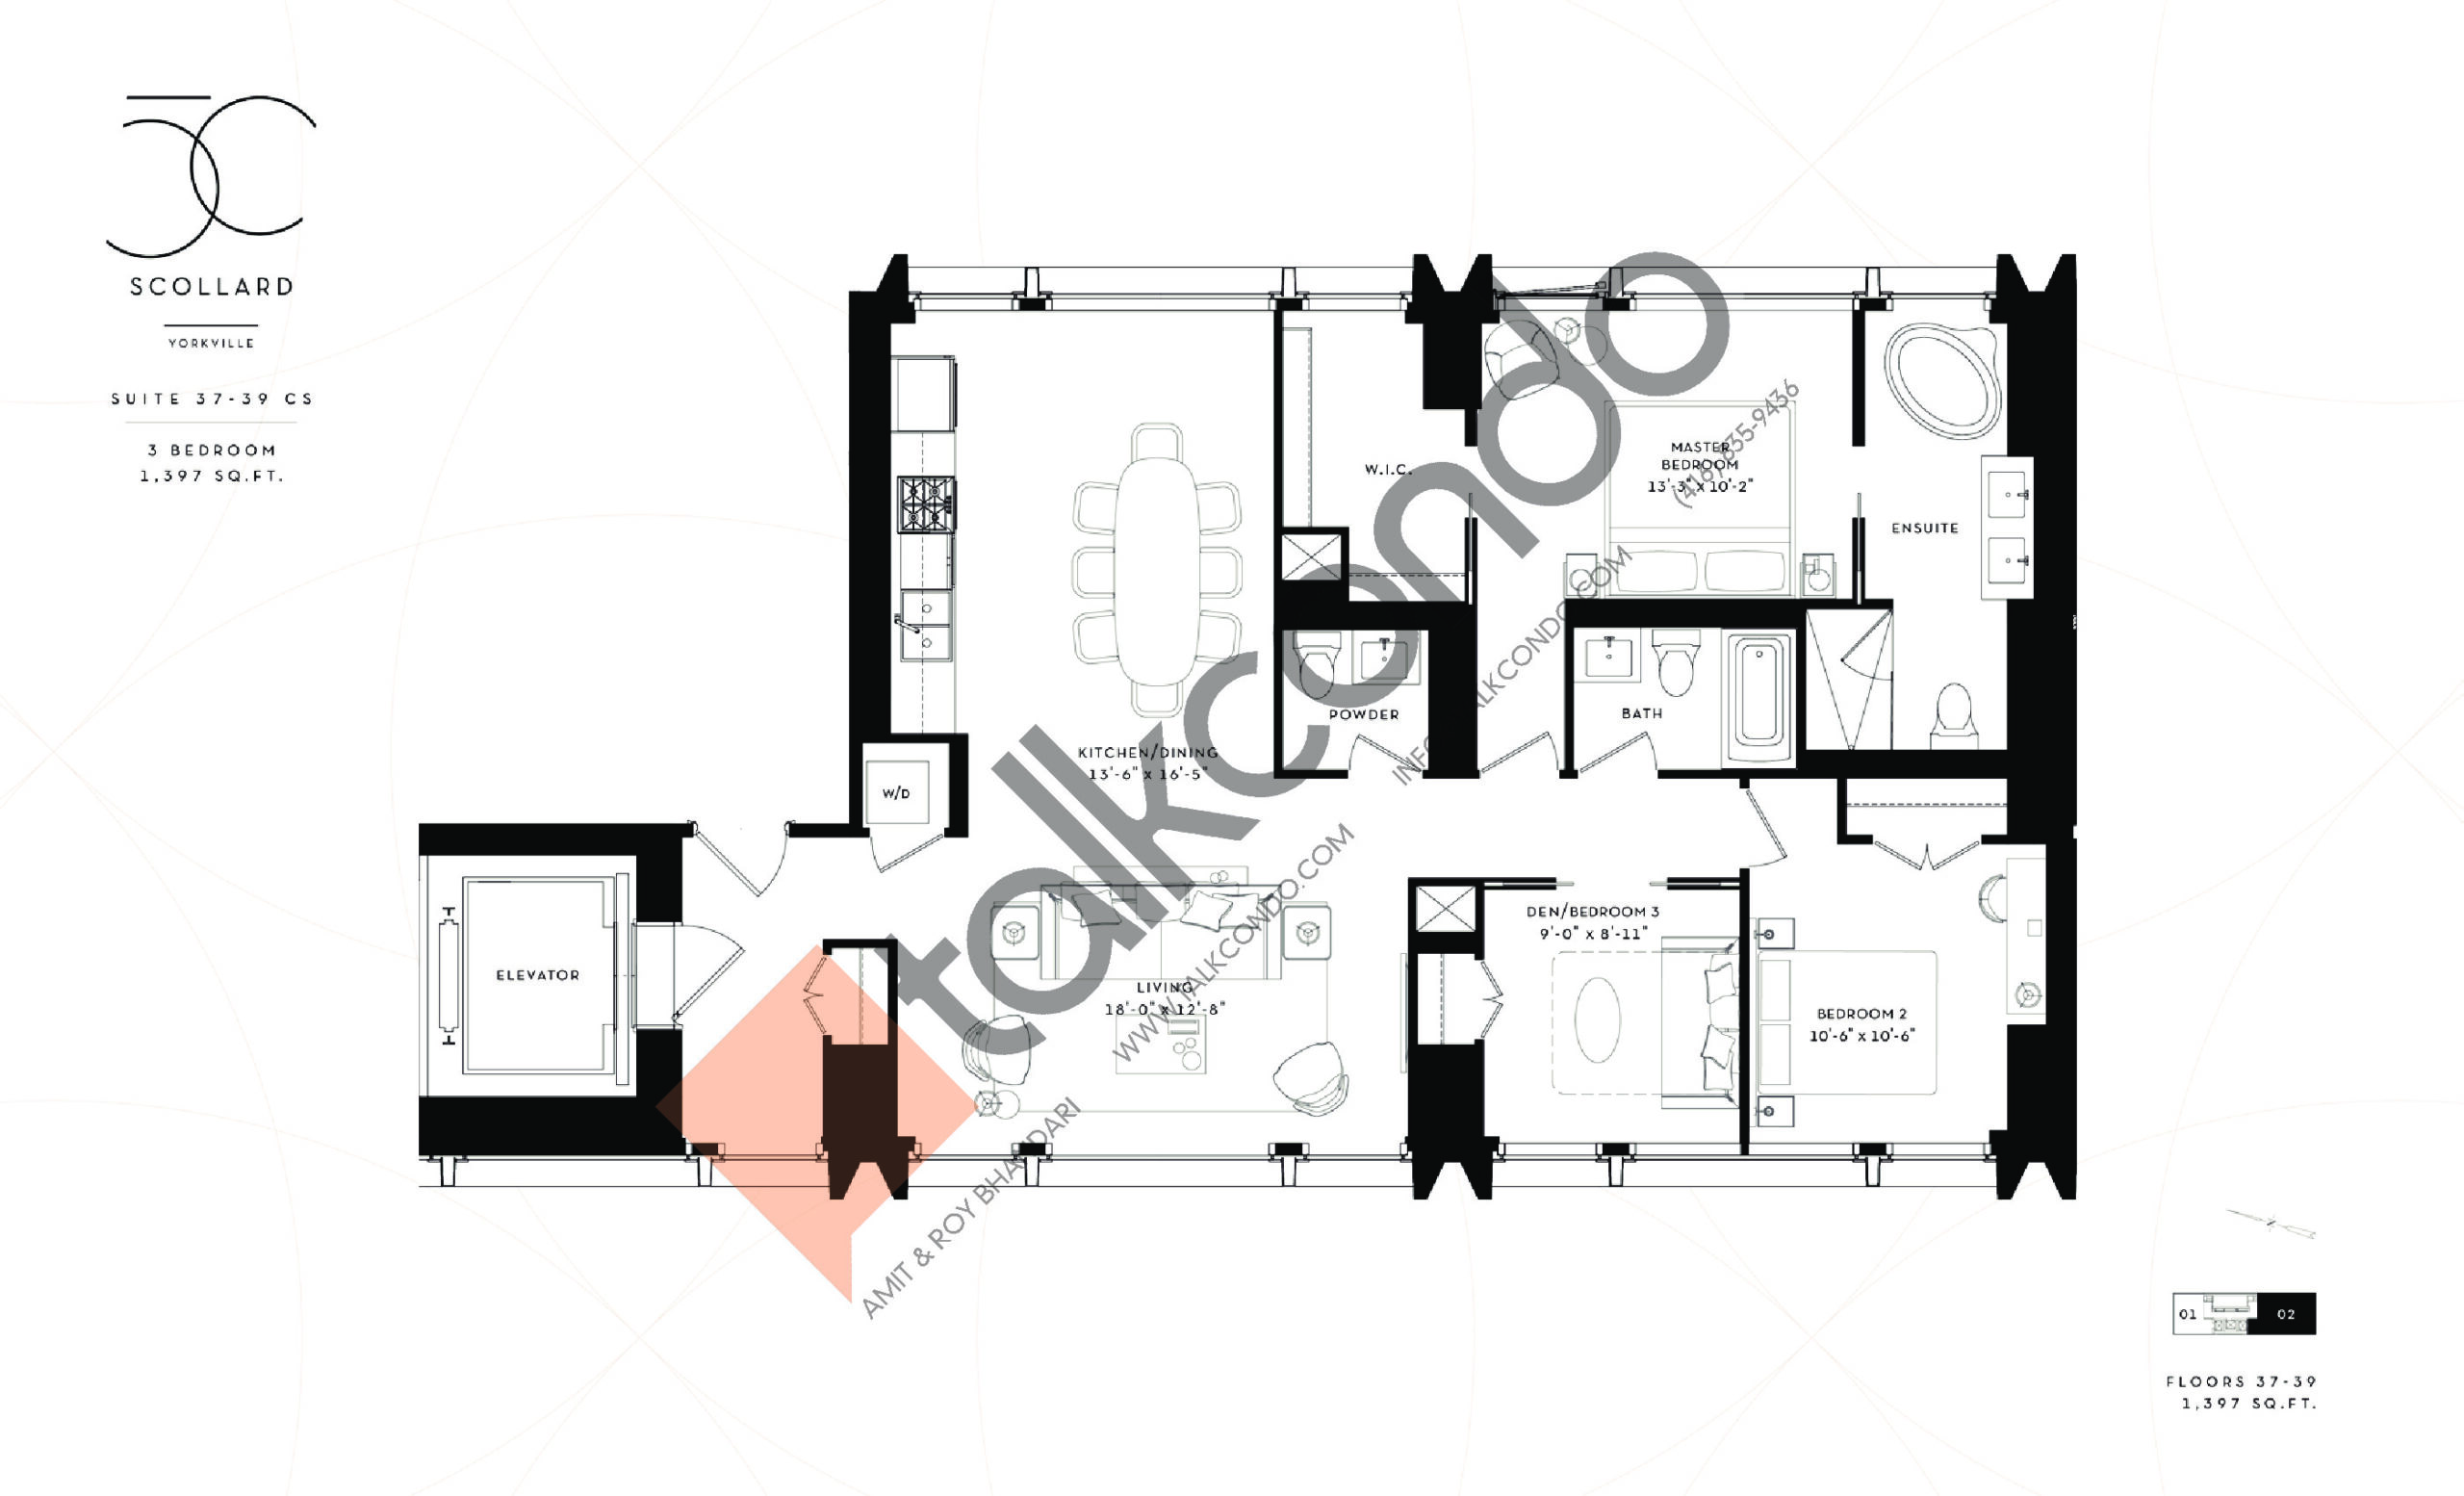 Suite 37-39 CS Floor Plan at Fifty Scollard Condos - 1397 sq.ft